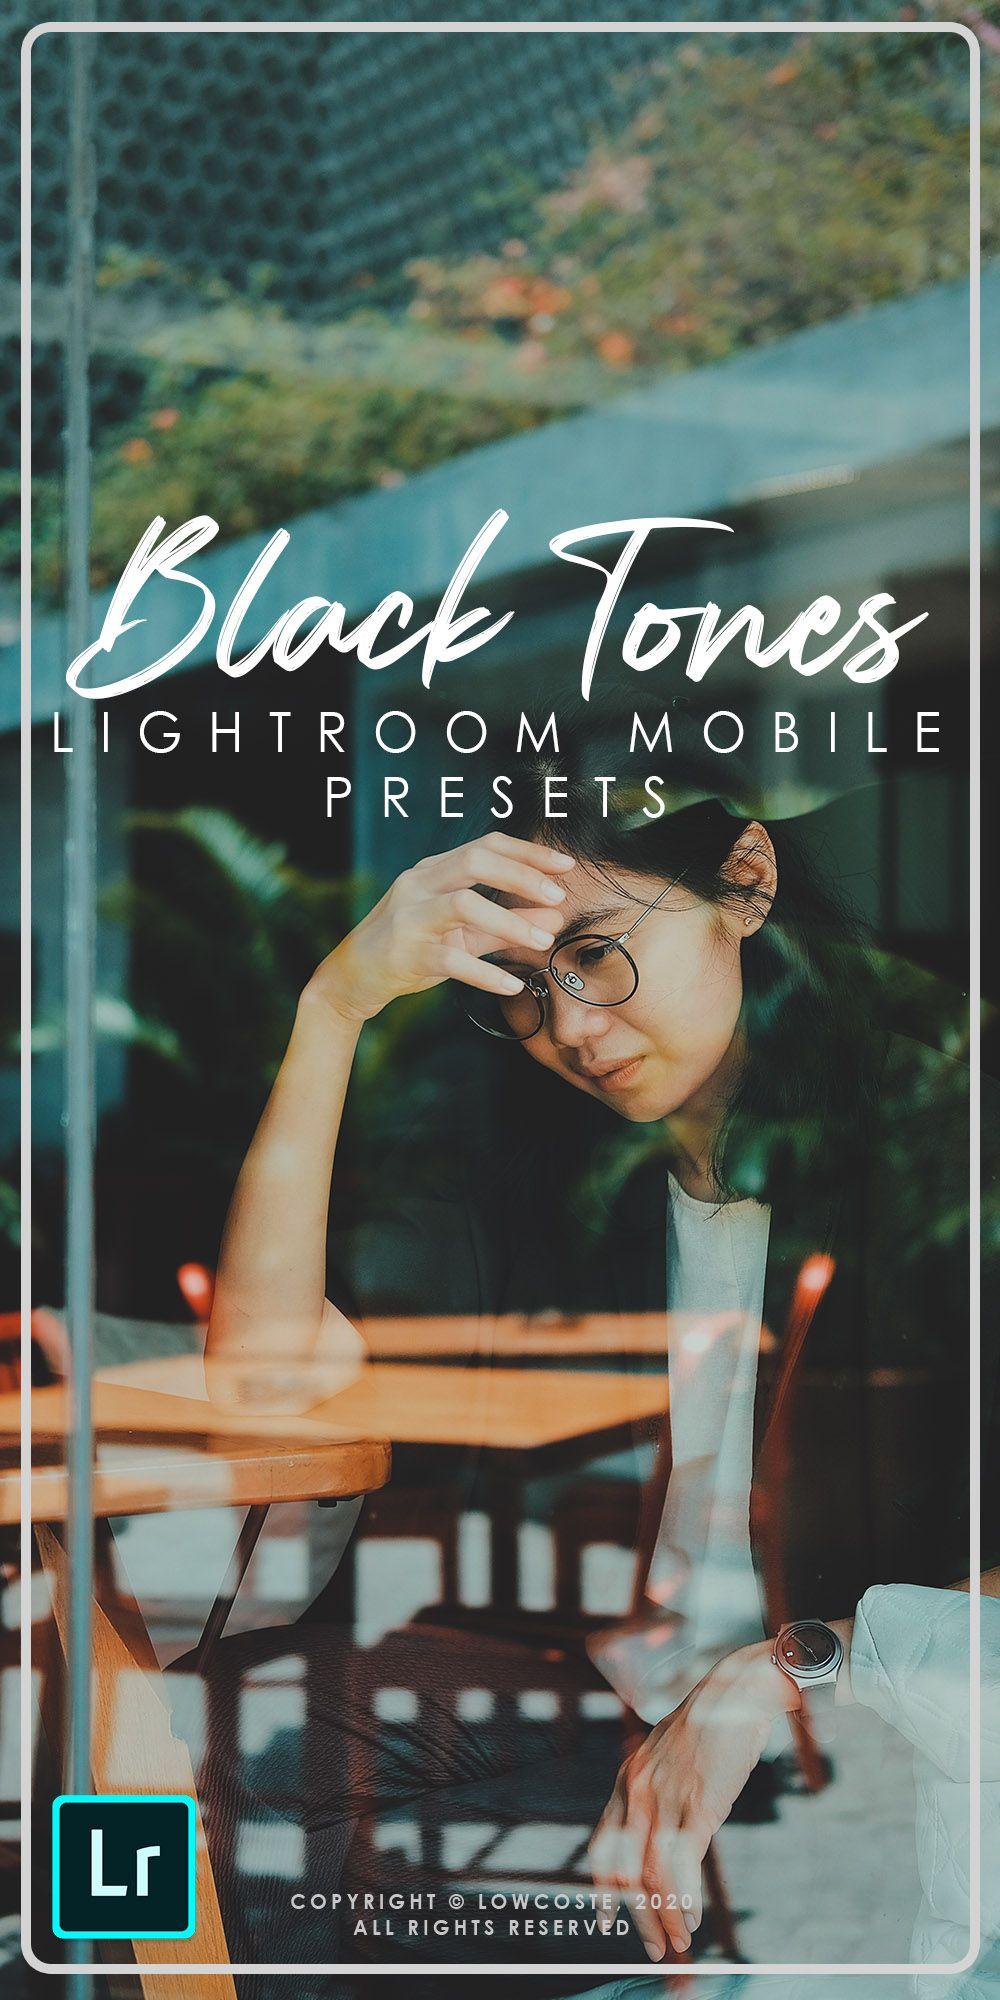 Black tones lightroom cc mobile presets in 2020